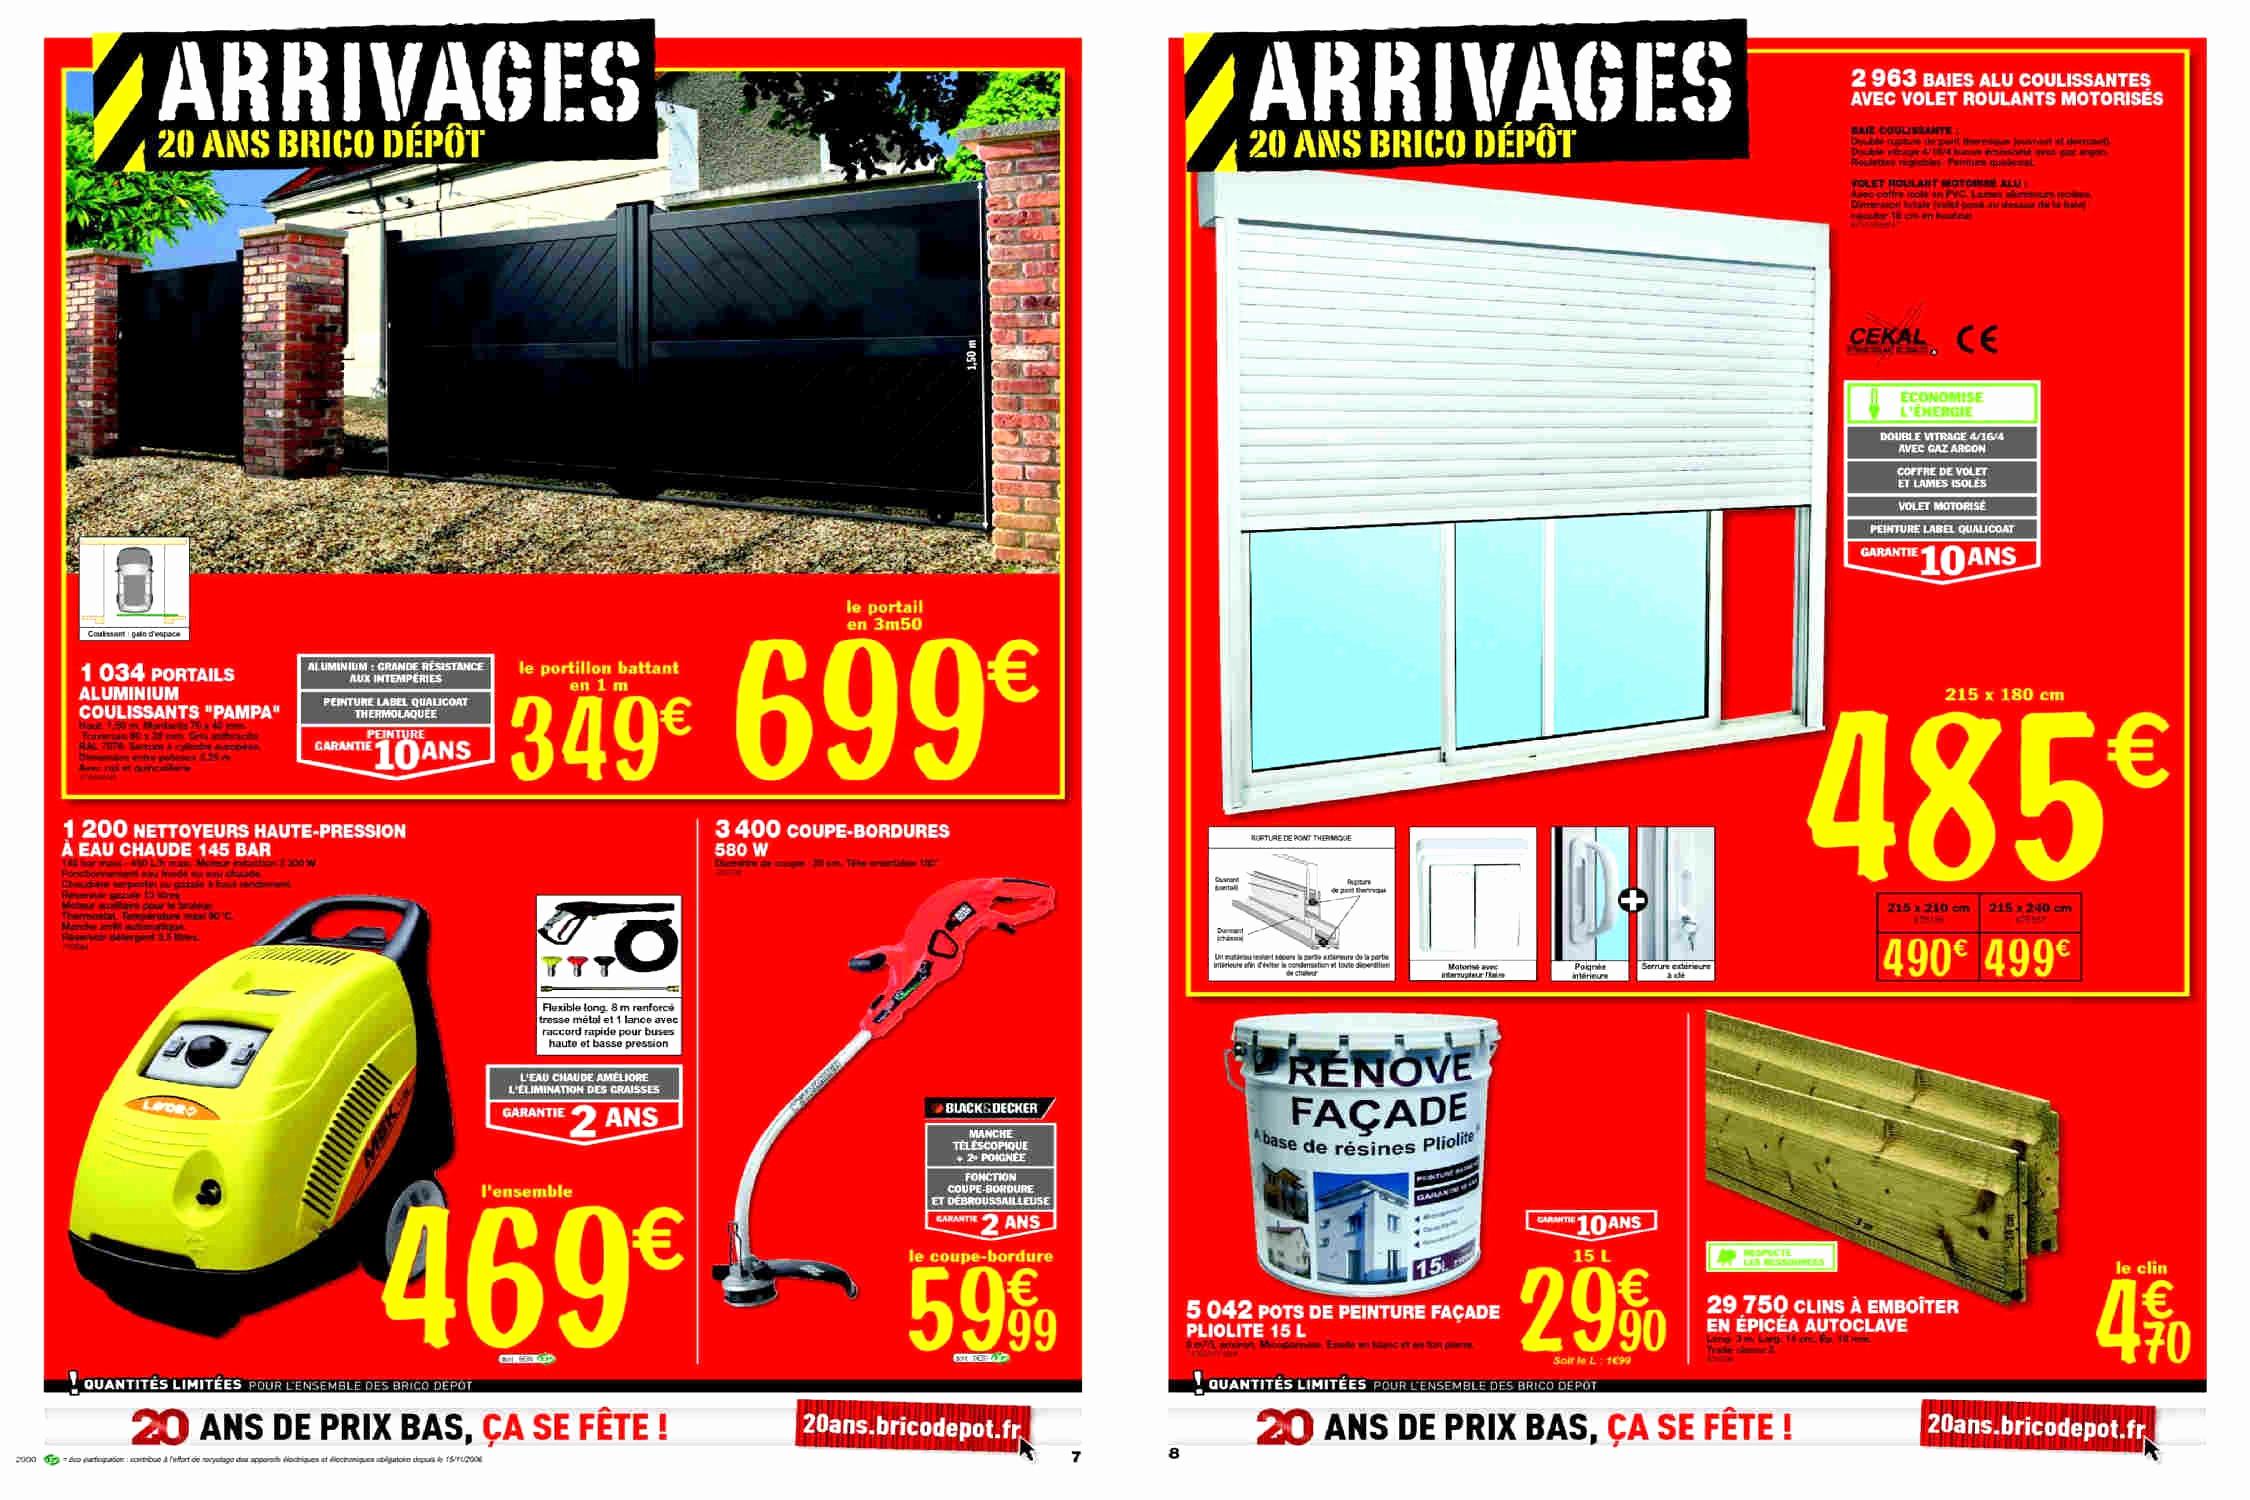 Malette Outils Brico Depot Inspirant Photos Montage Portail Coulissant Brico Depot Inspirant Belle Abri Brico